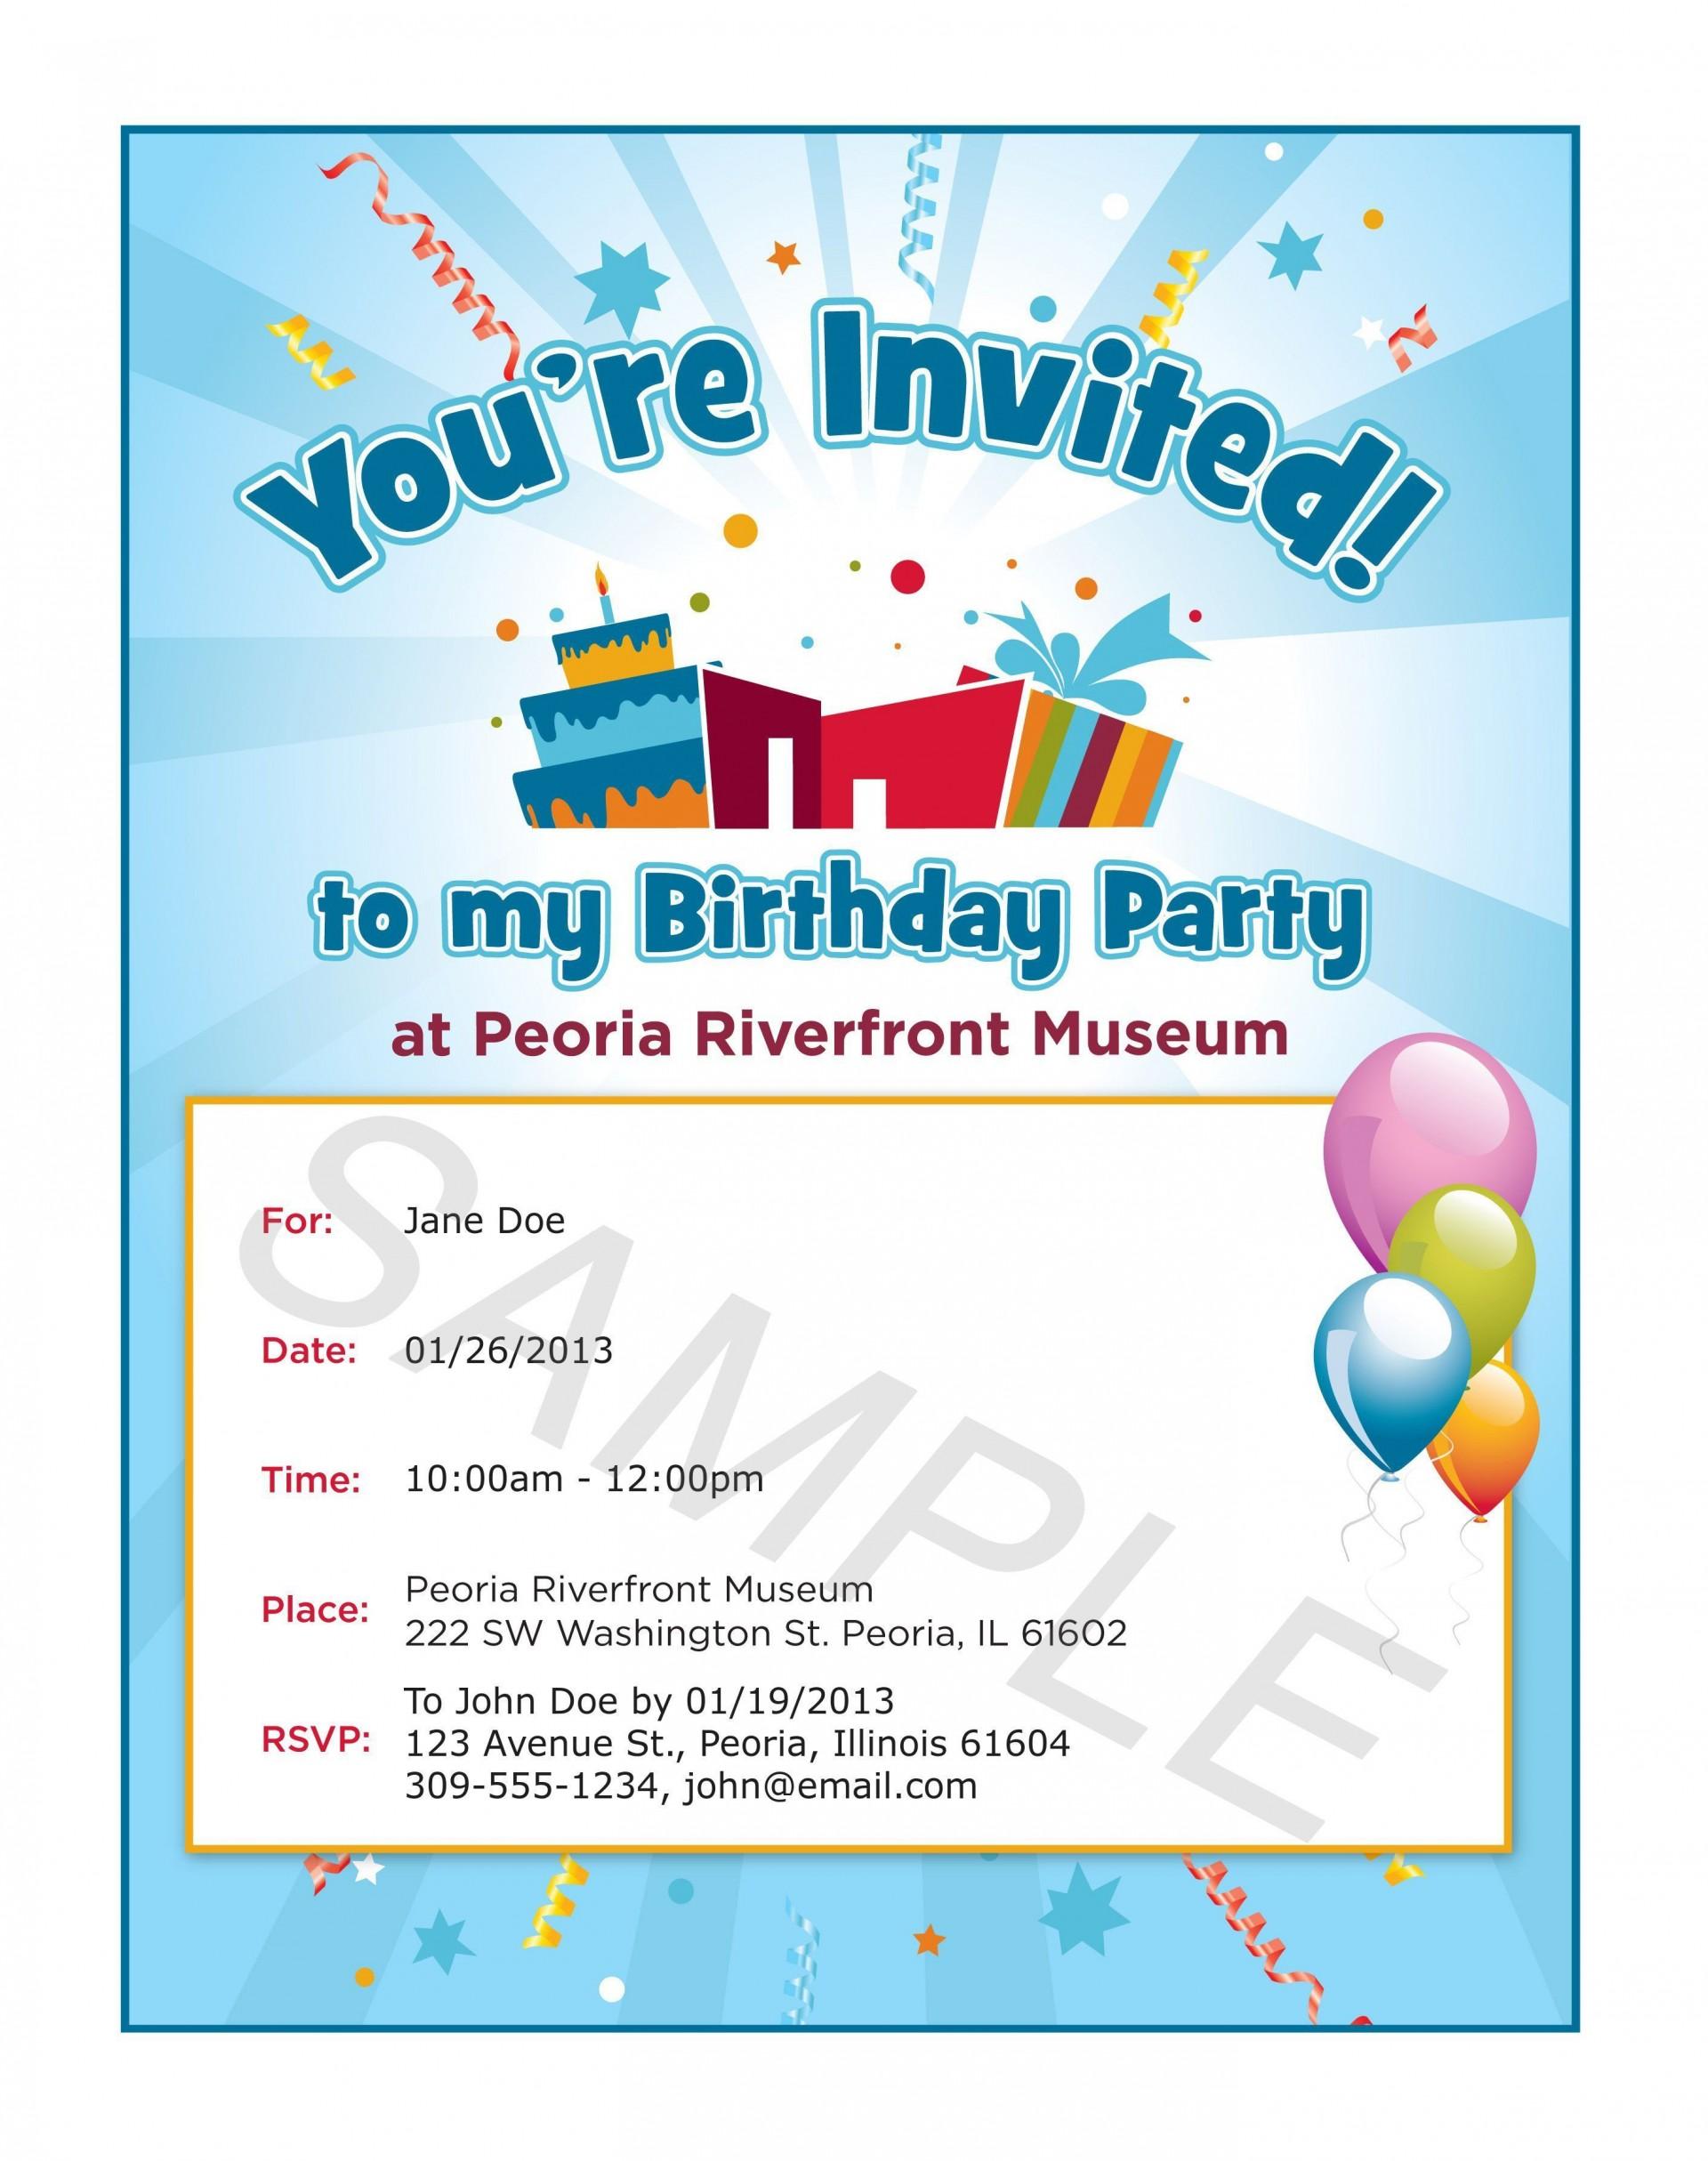 002 Fascinating Birthday Party Invitation Template Word Idea  40th Wording Sample Unicorn Free1920